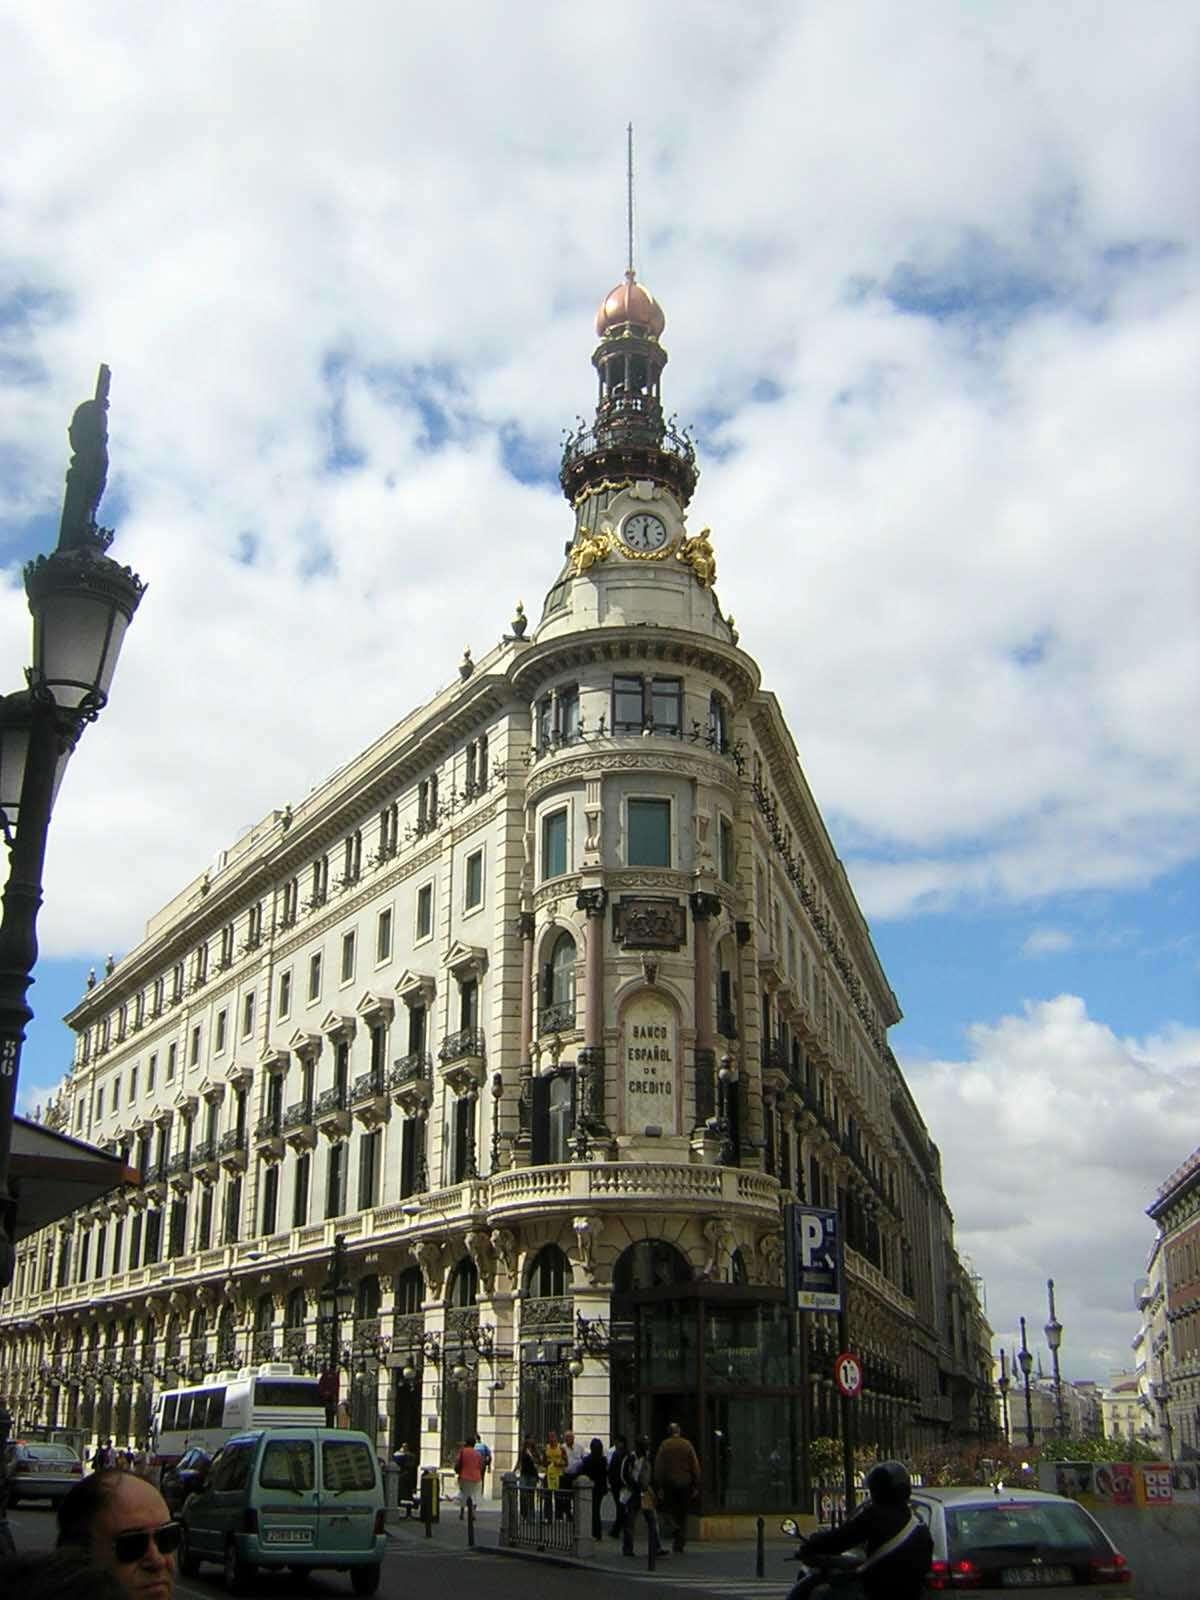 Banco Espanhol de crédito